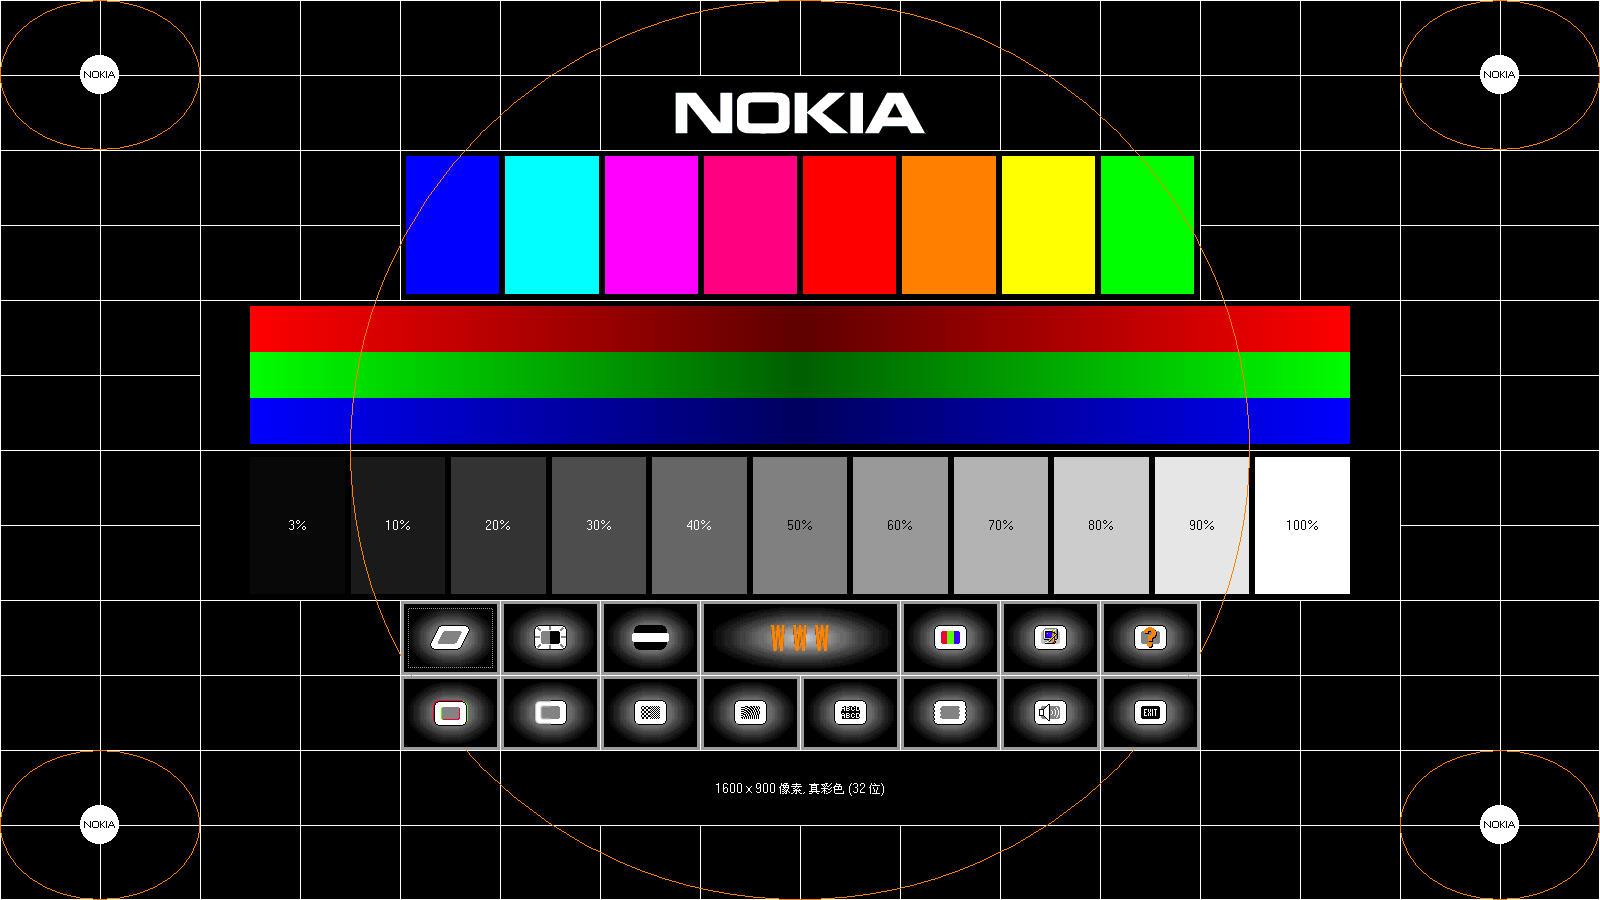 Nokia MonitorTest(NokiaMT显示器测试软件) V